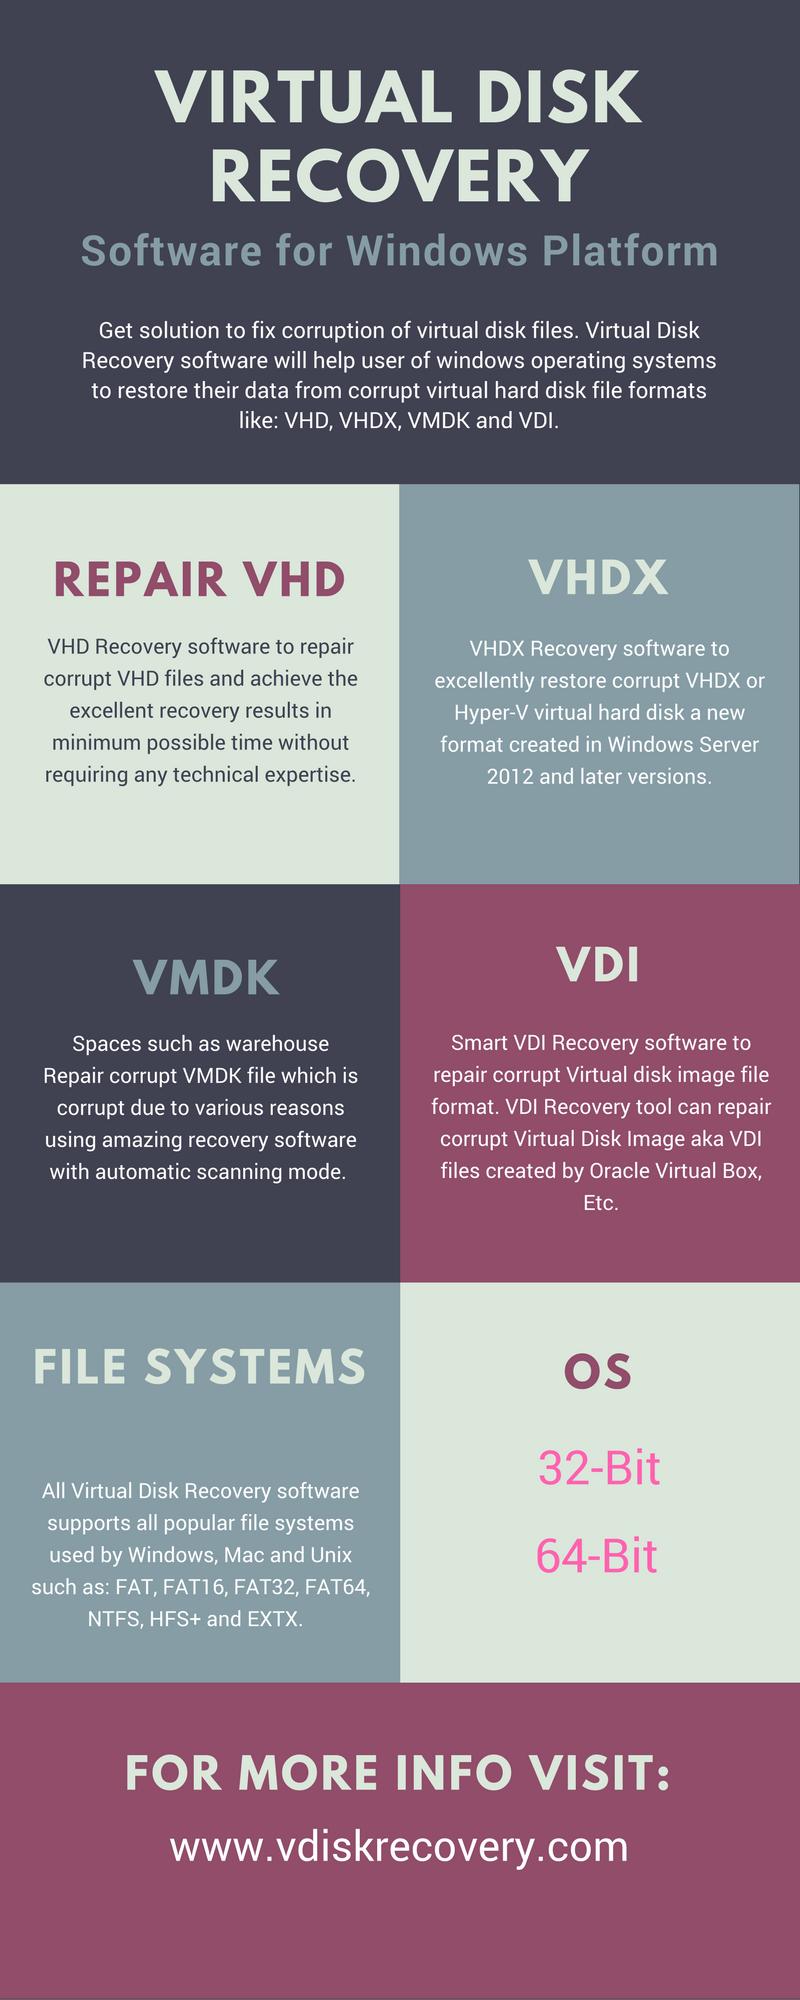 Virtual Disk Recovery Software: VHD, VHDX, VMDK and VDI